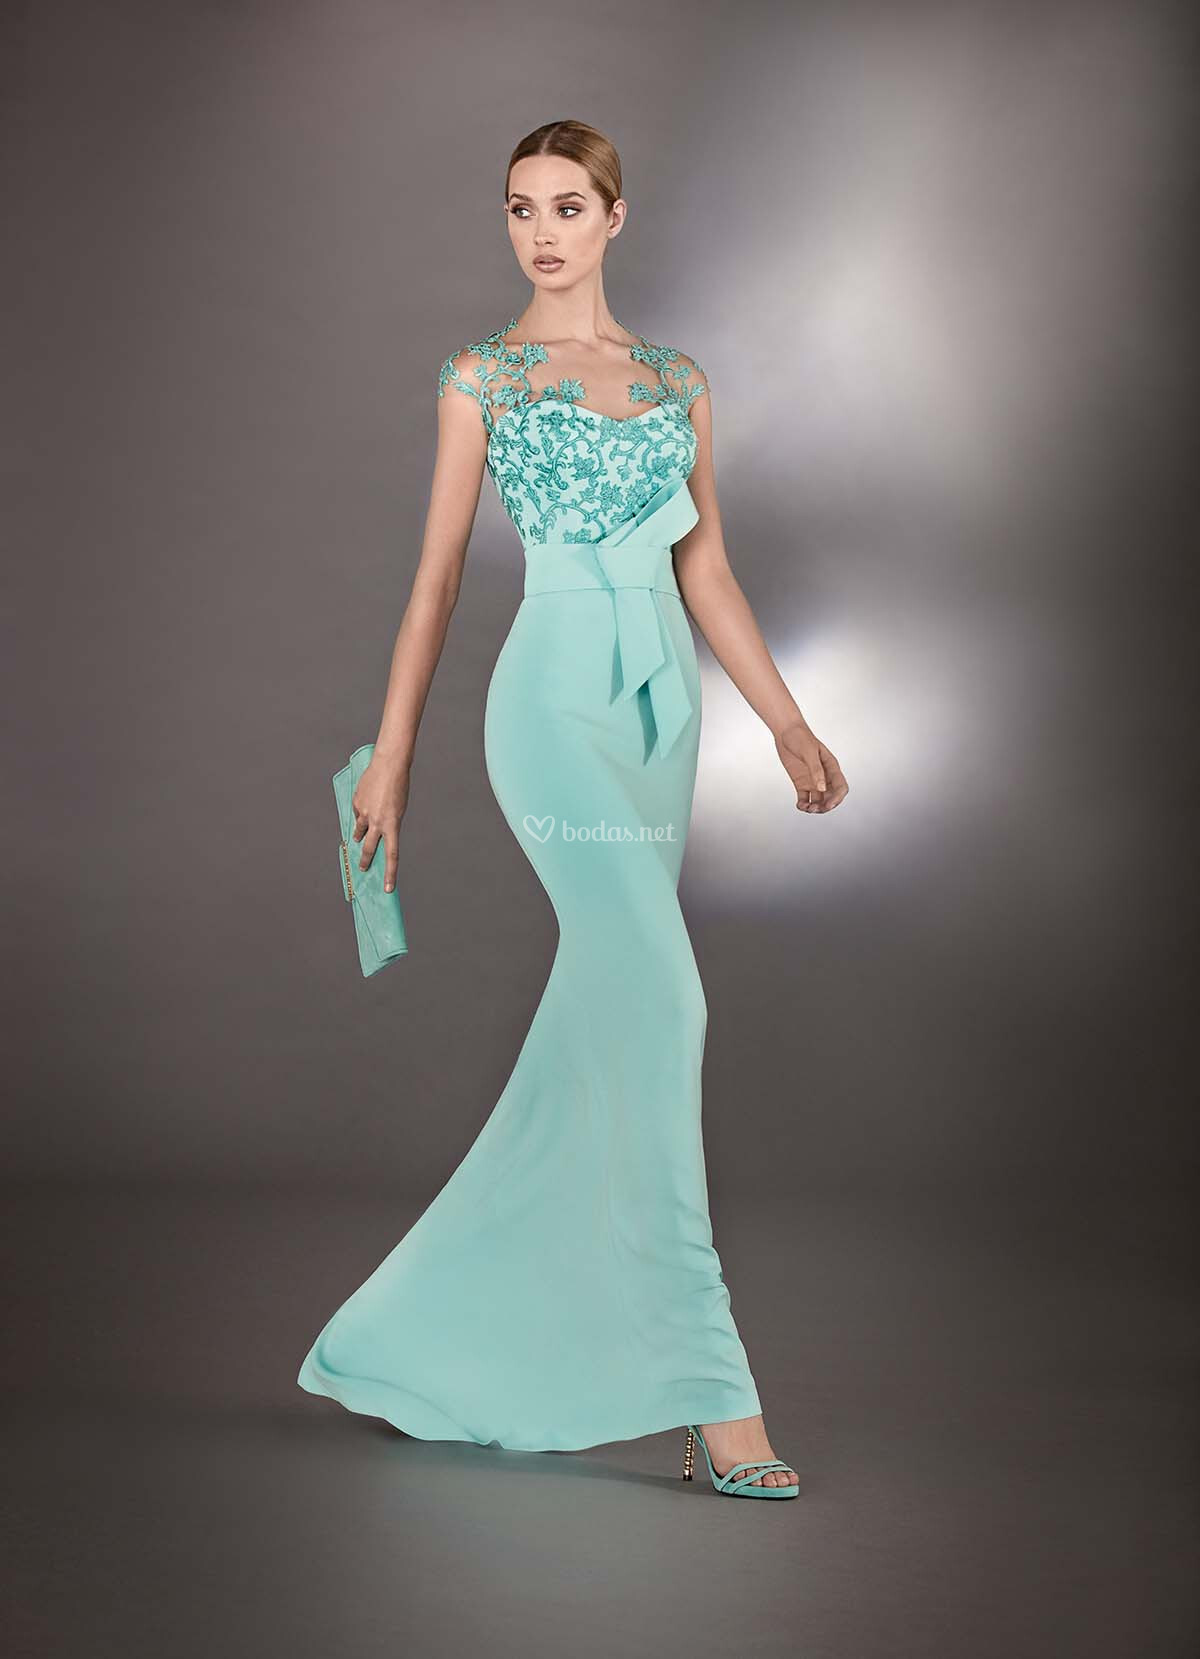 Vestido de Madrina de Hannibal Laguna Atelier - TOKURA